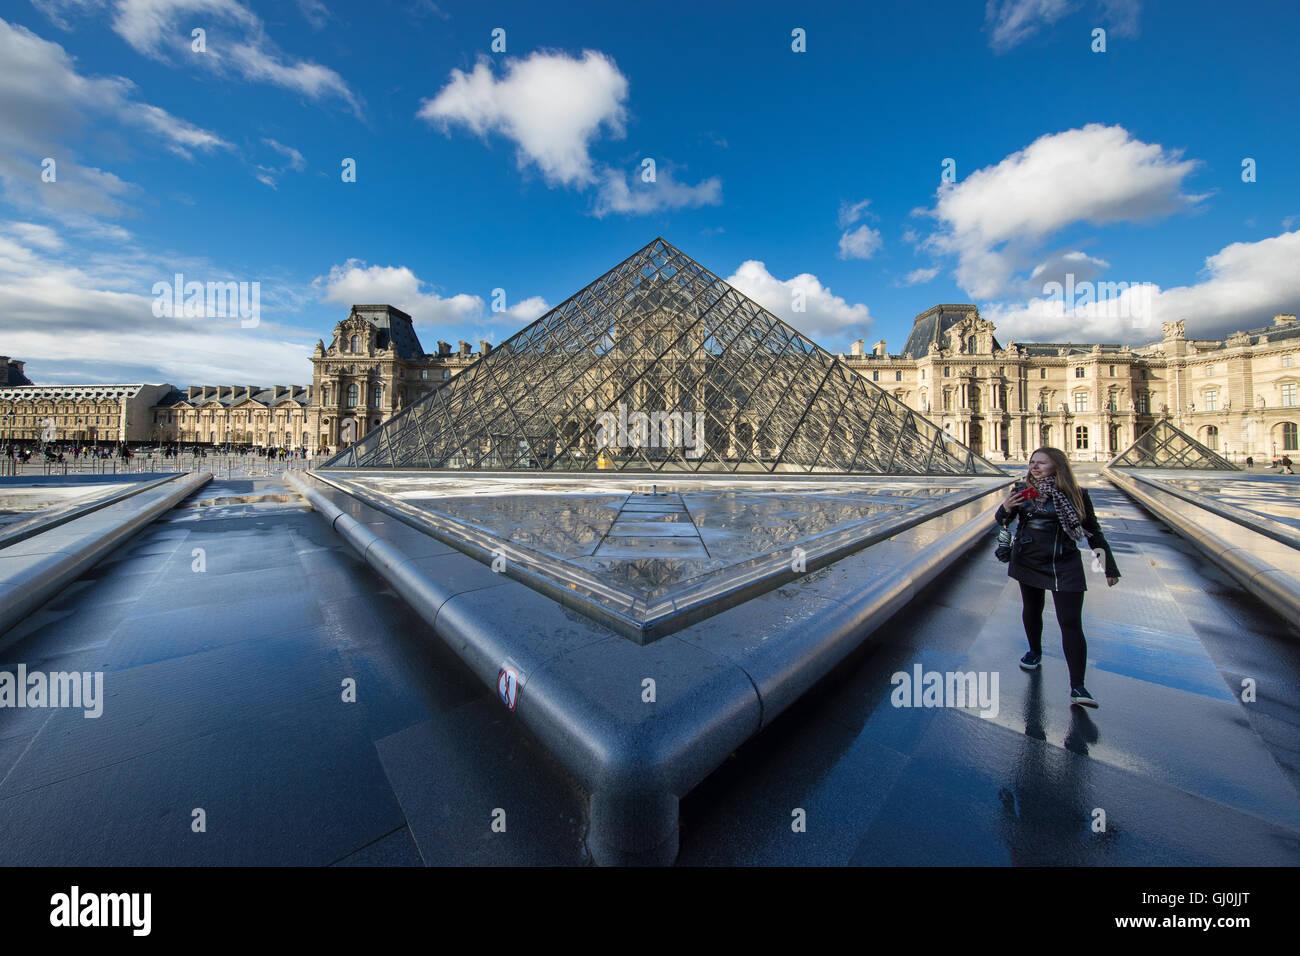 a woman at the Pyramide du Louvre, Paris, France - Stock Image